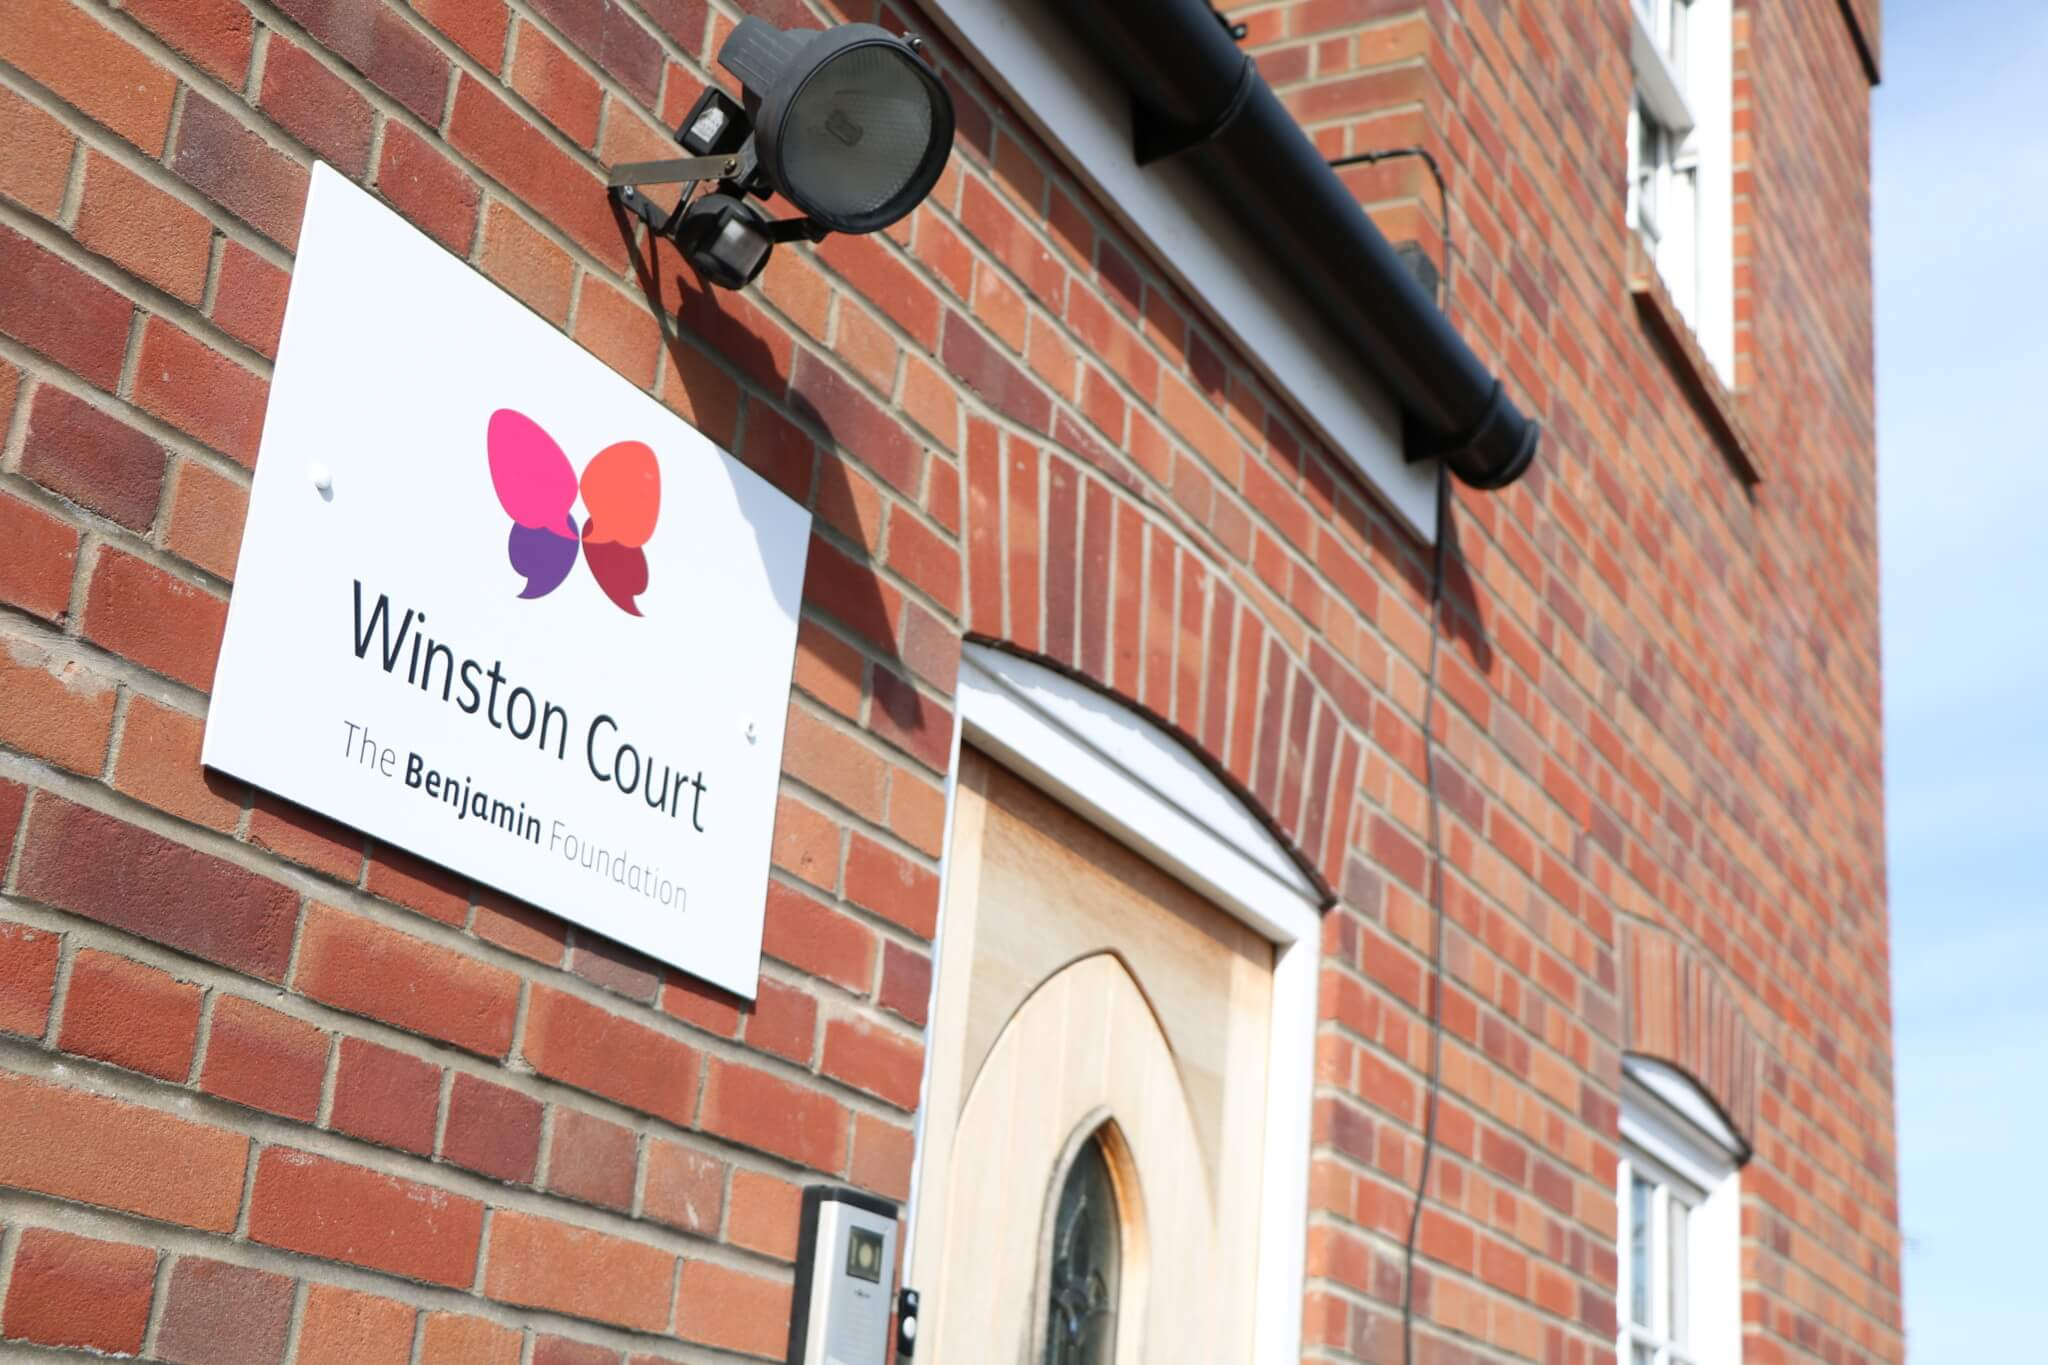 Winston Court - sign